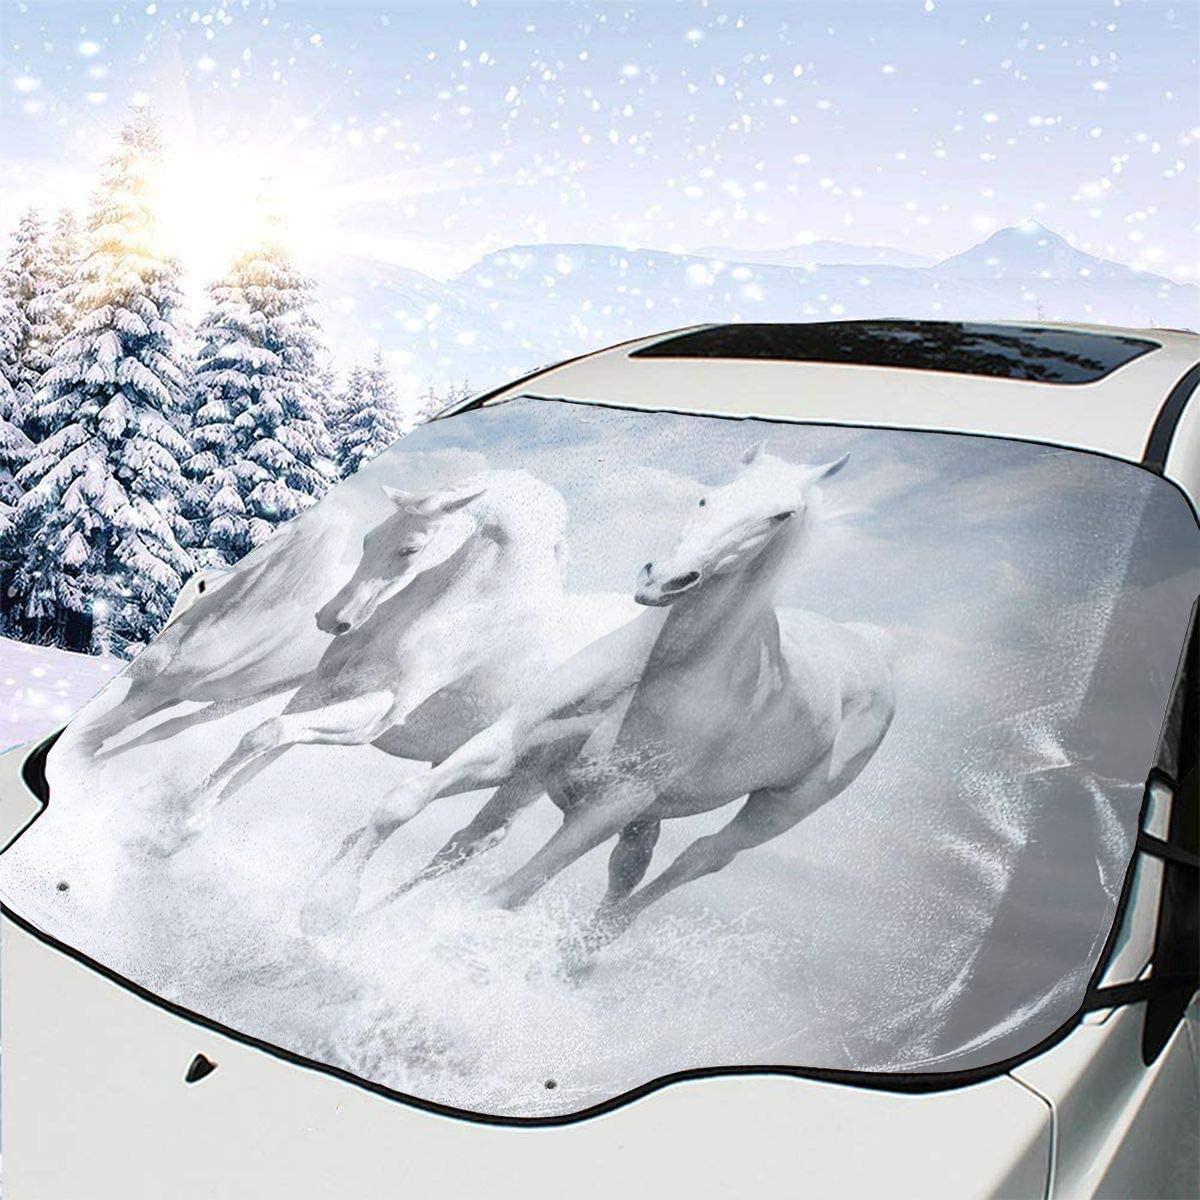 THONFIRE Car Front Window Windshield Winter Sunshade Three White Horse Cover Rainproof Blocks Heat Damage Free Visor Protector Trucks Summer Heat Insulation